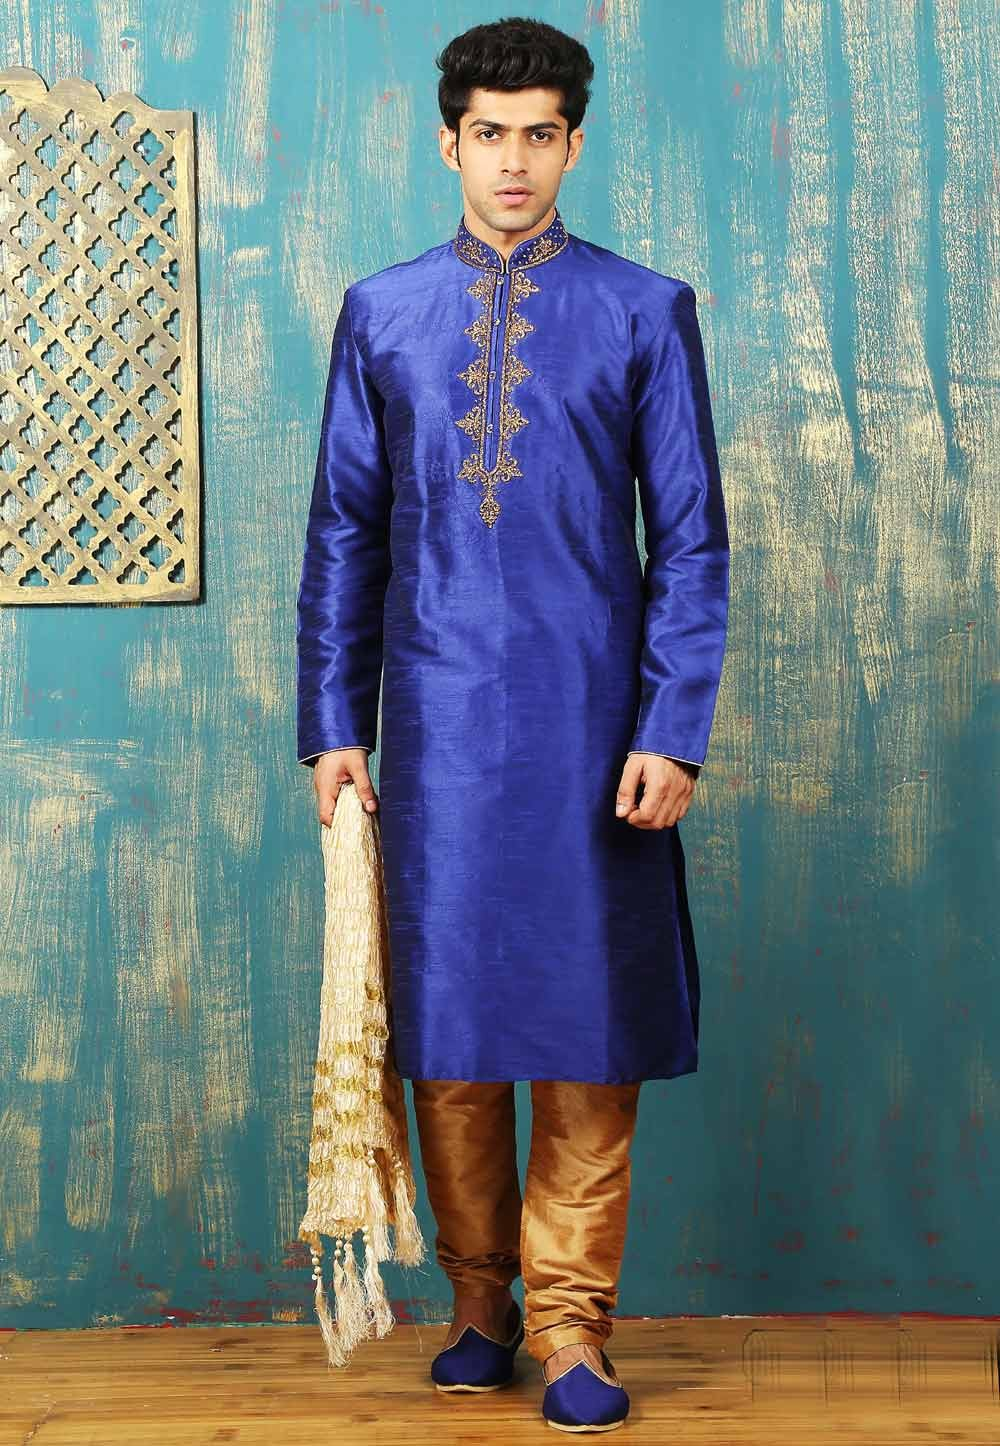 Exquisite Dupion Art Silk & Royal Blue Color Men's Readymade Kurta Pajama.